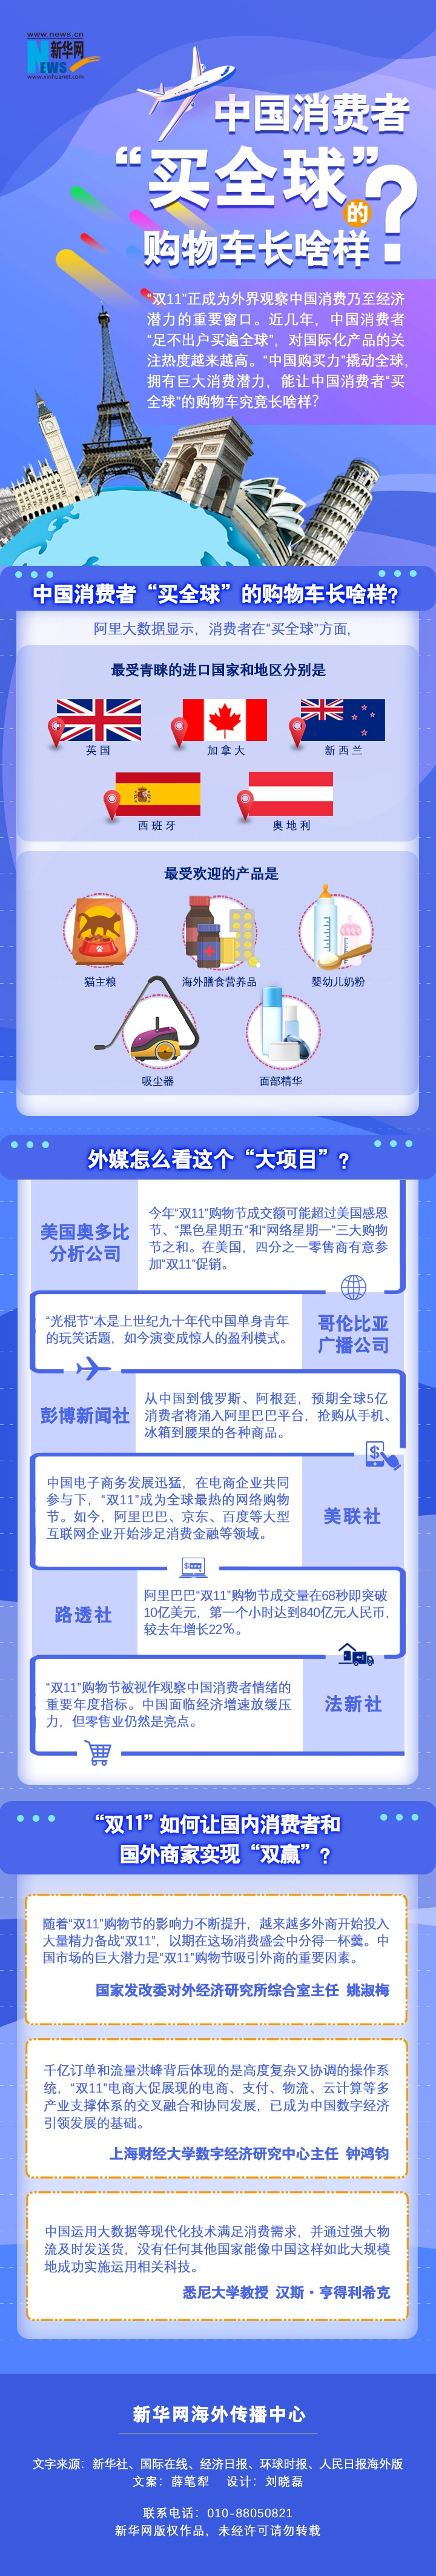 psn香港注册地区 史上最便宜的AMG卖多少钱才不招黑?